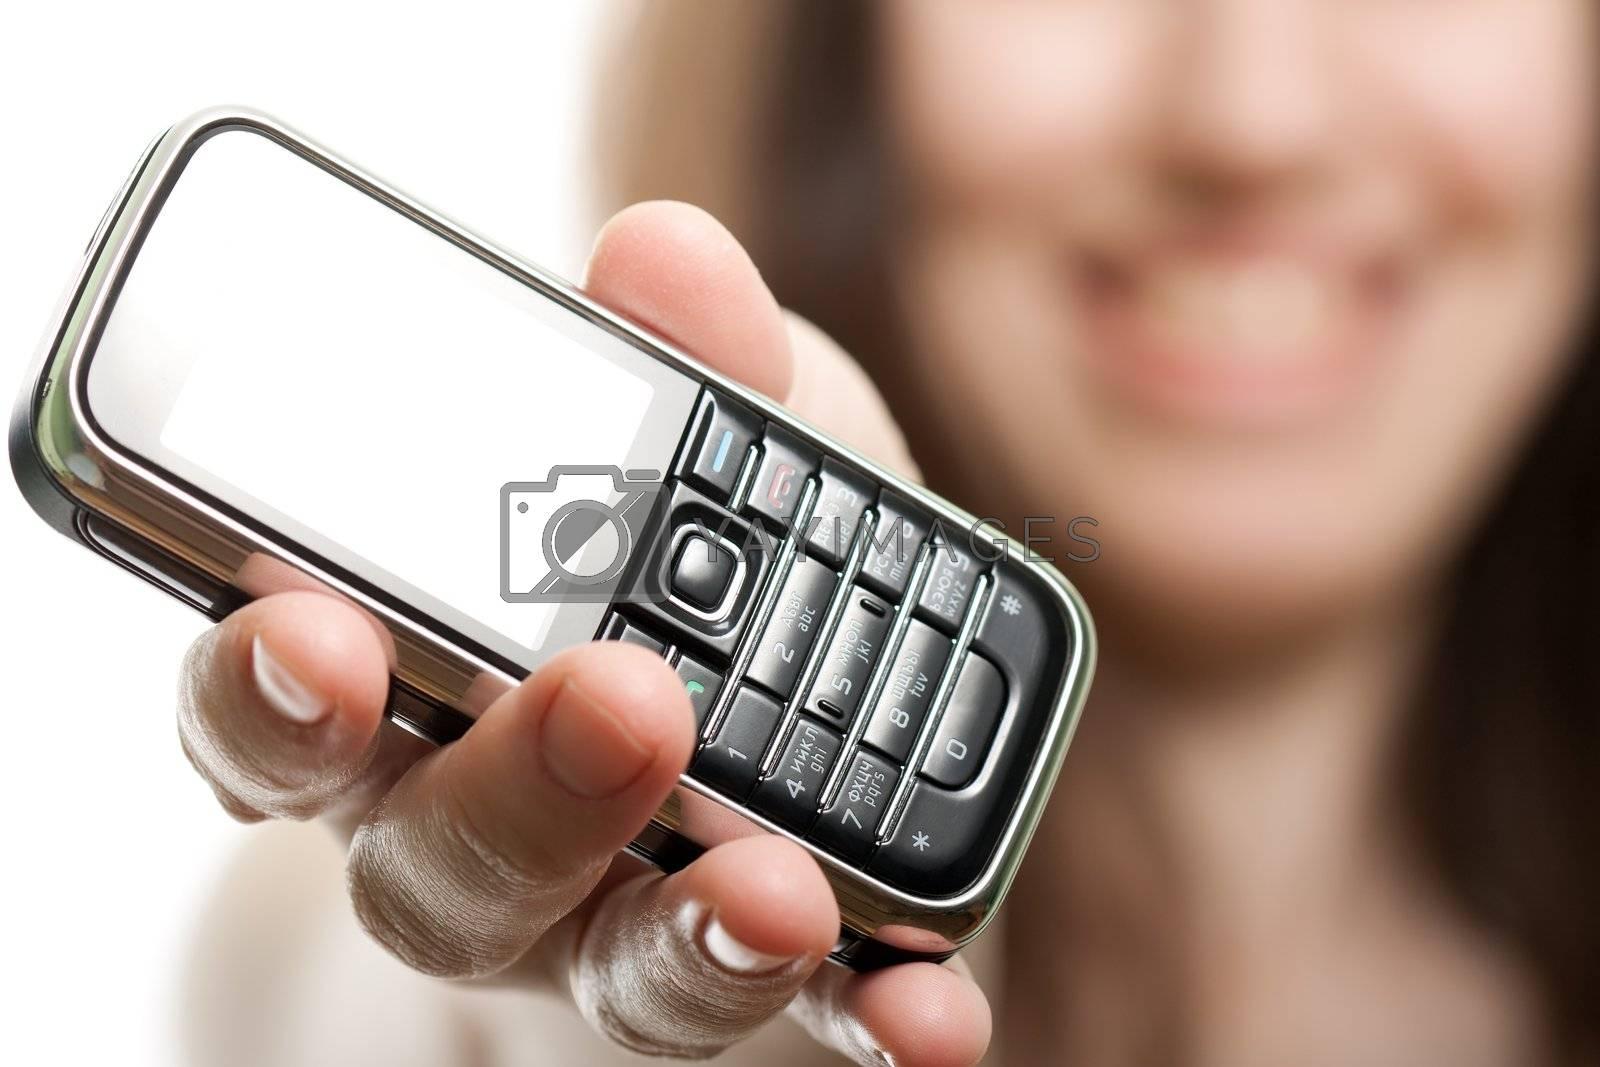 Smiling women holding mobile communication phone